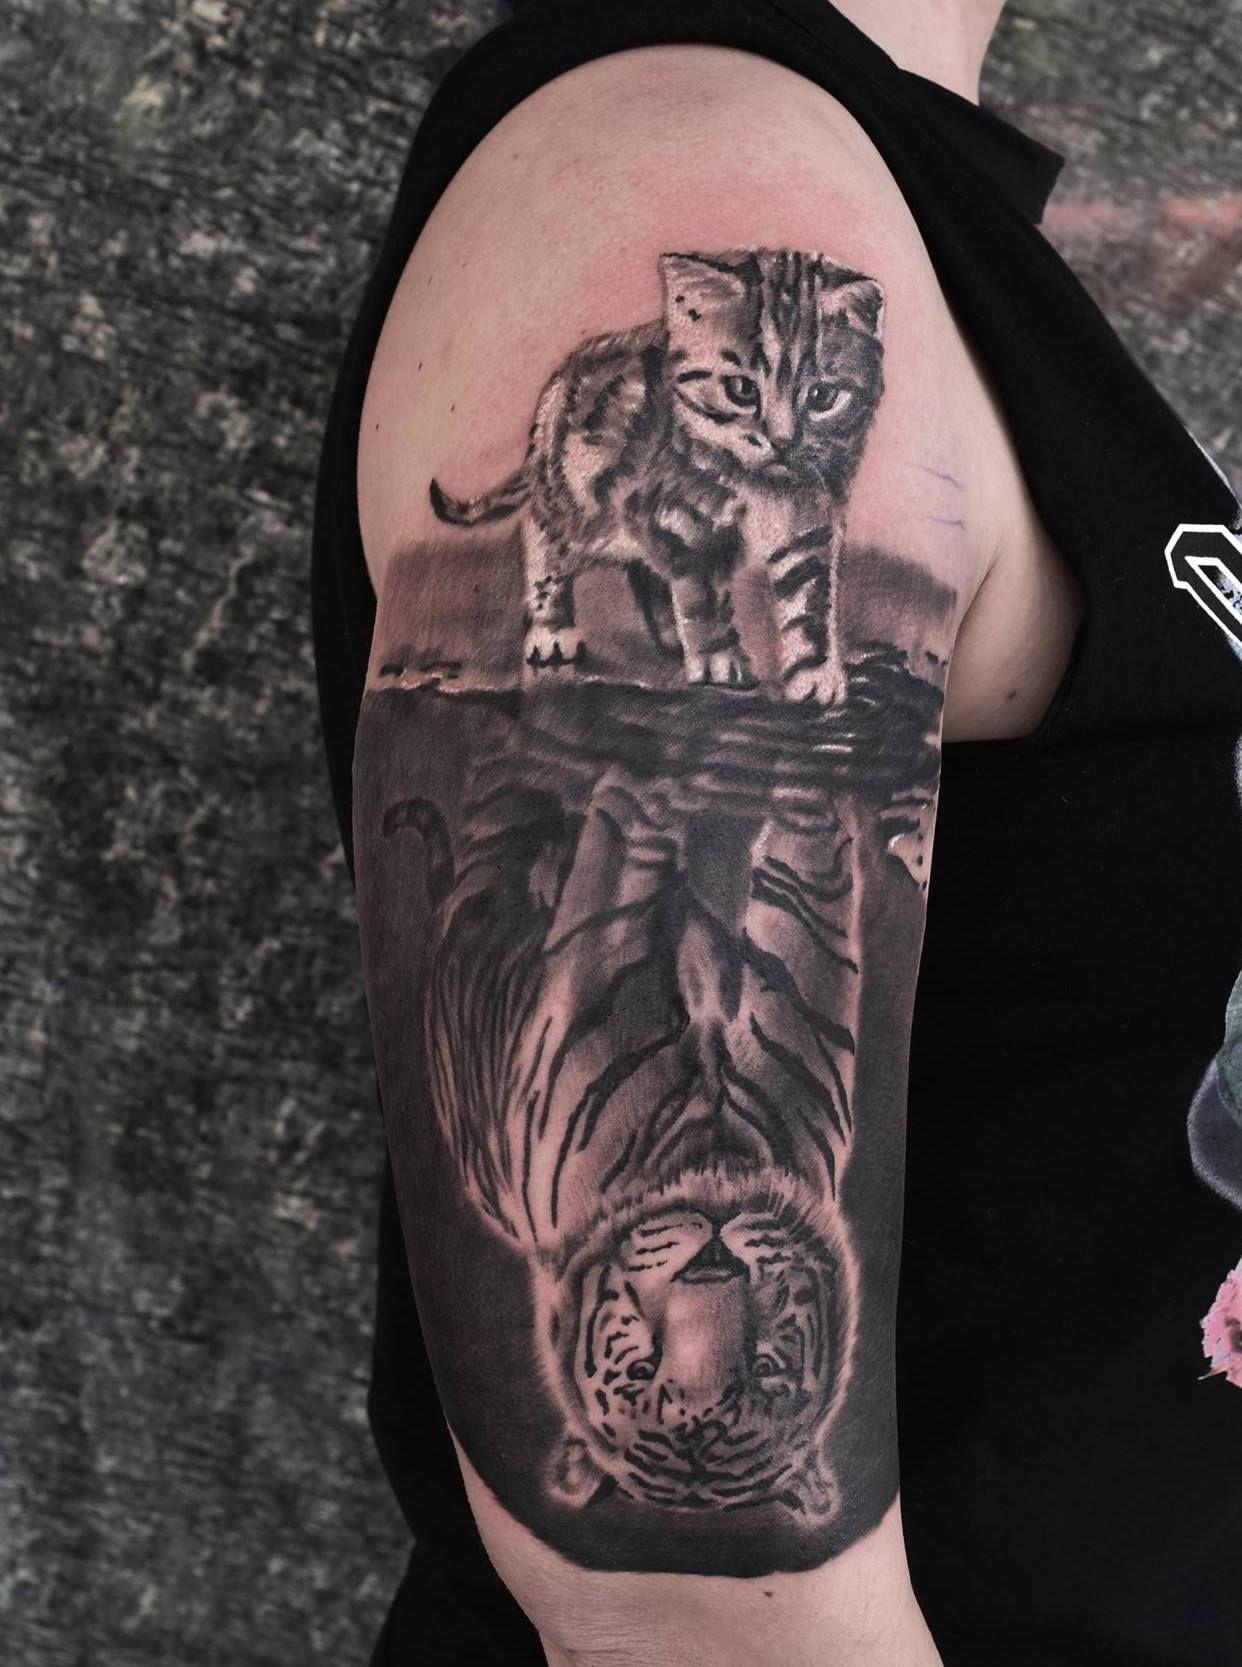 Tiger Tattoo Artist Mindy Www Holytrinitytattoos Co Uk Holytrinitytattoos Gmail Com Send Us A Message Call U Tiger Tattoo Tattoo Studio Tattoos